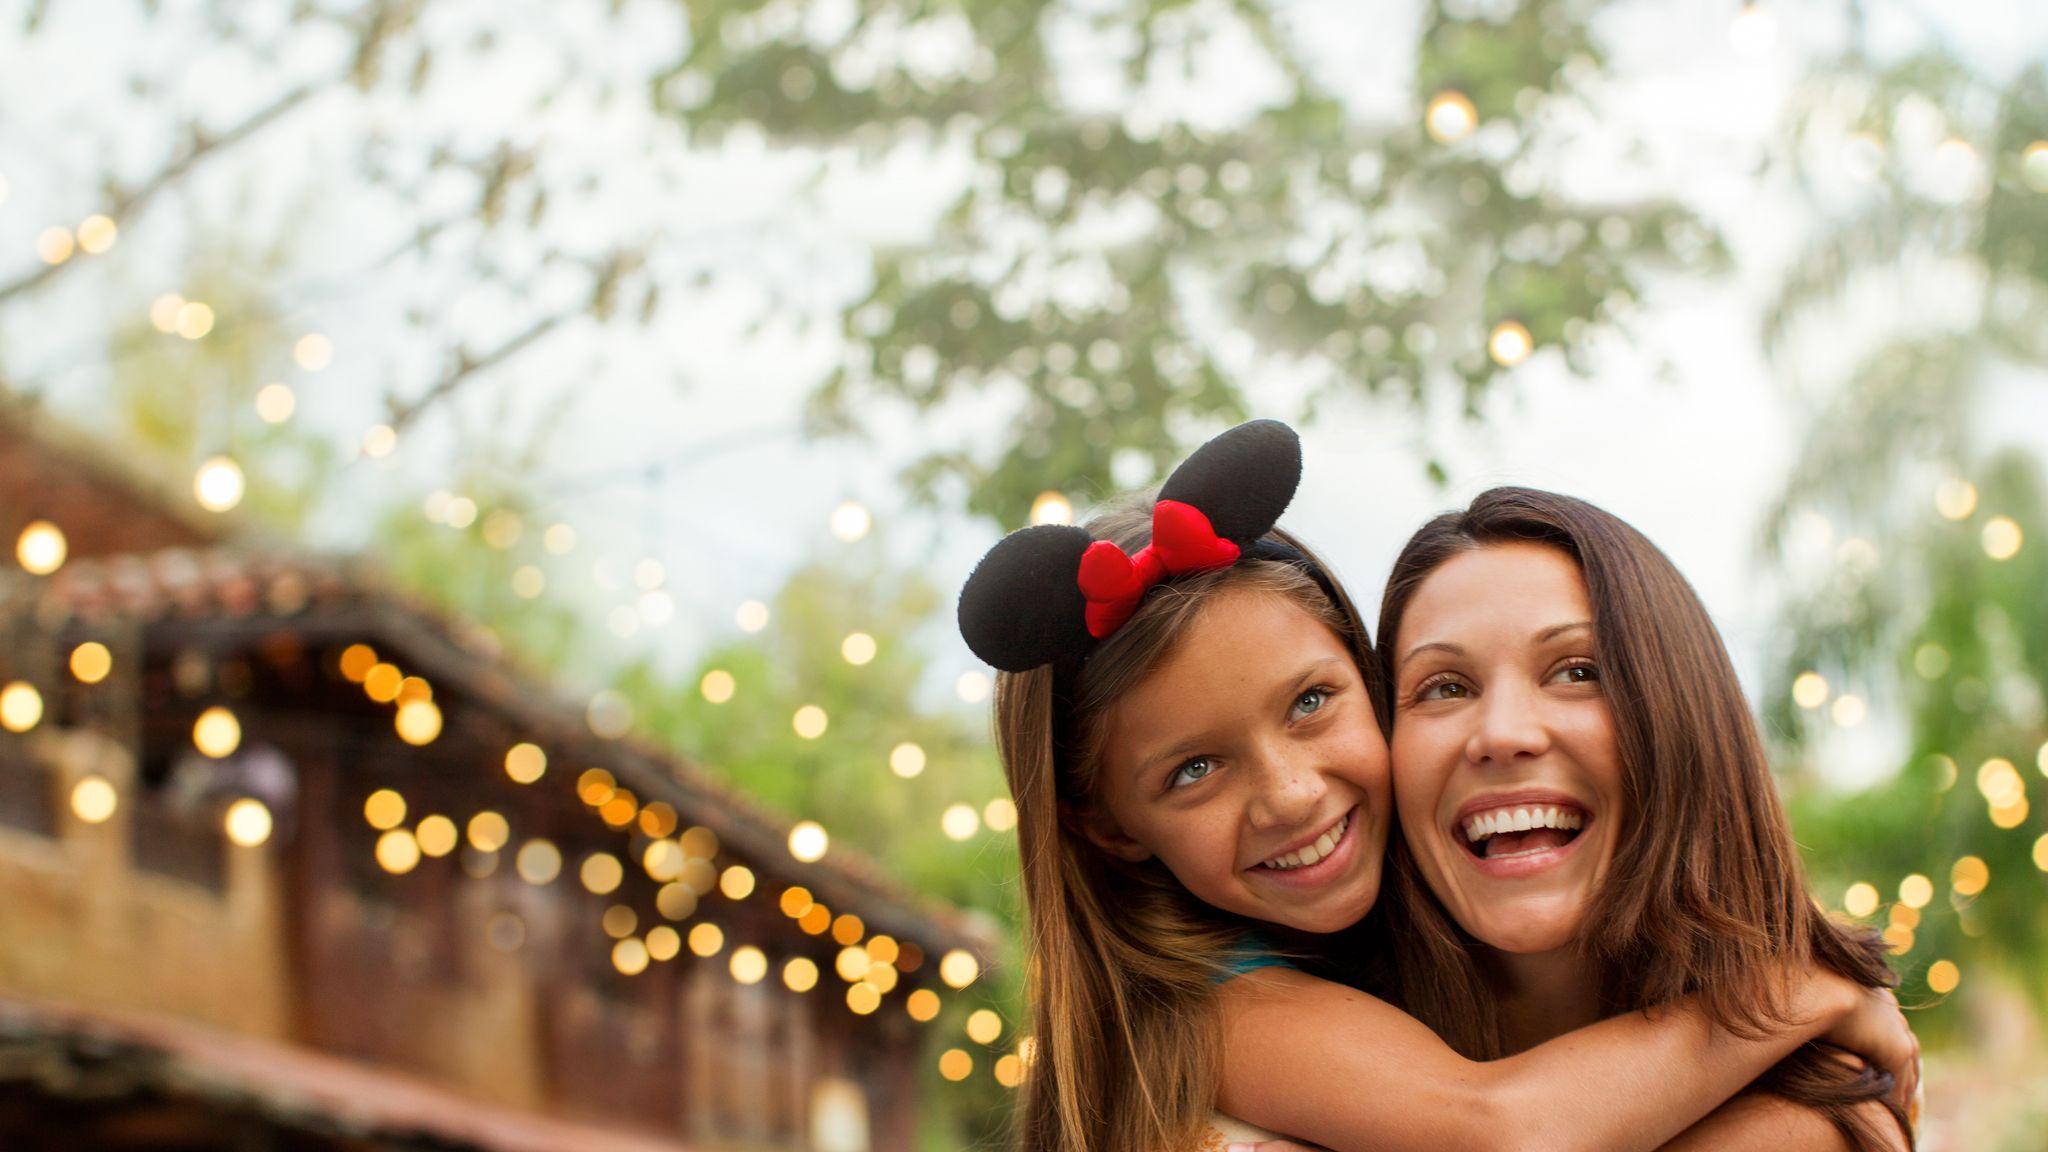 Mouse Ears at Walt Disney World